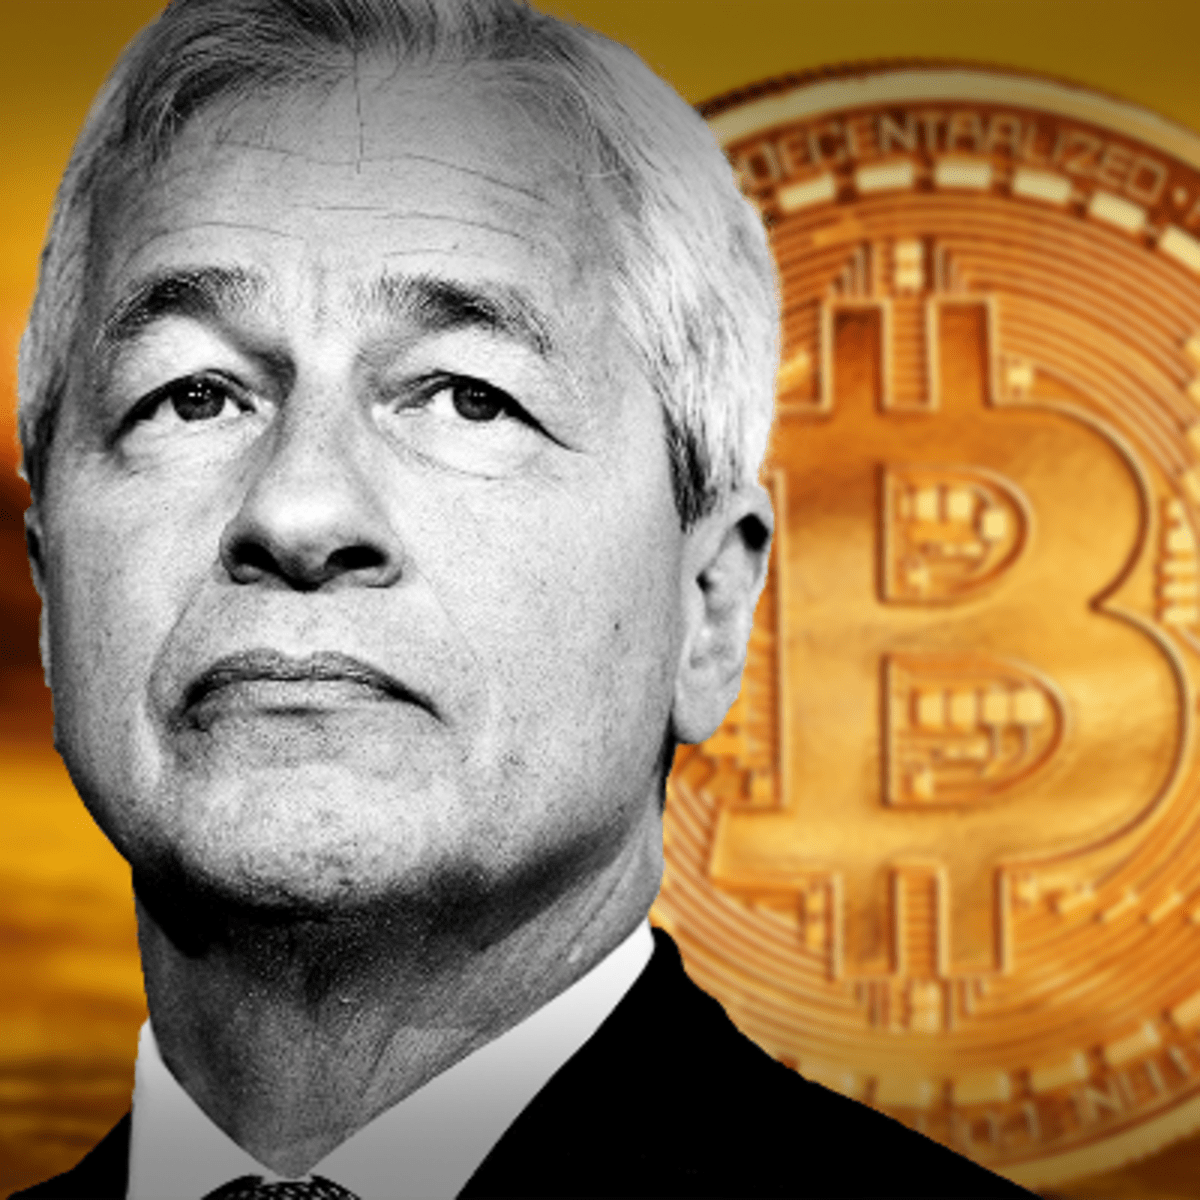 jp morgan market manipuliavimas bitcoin